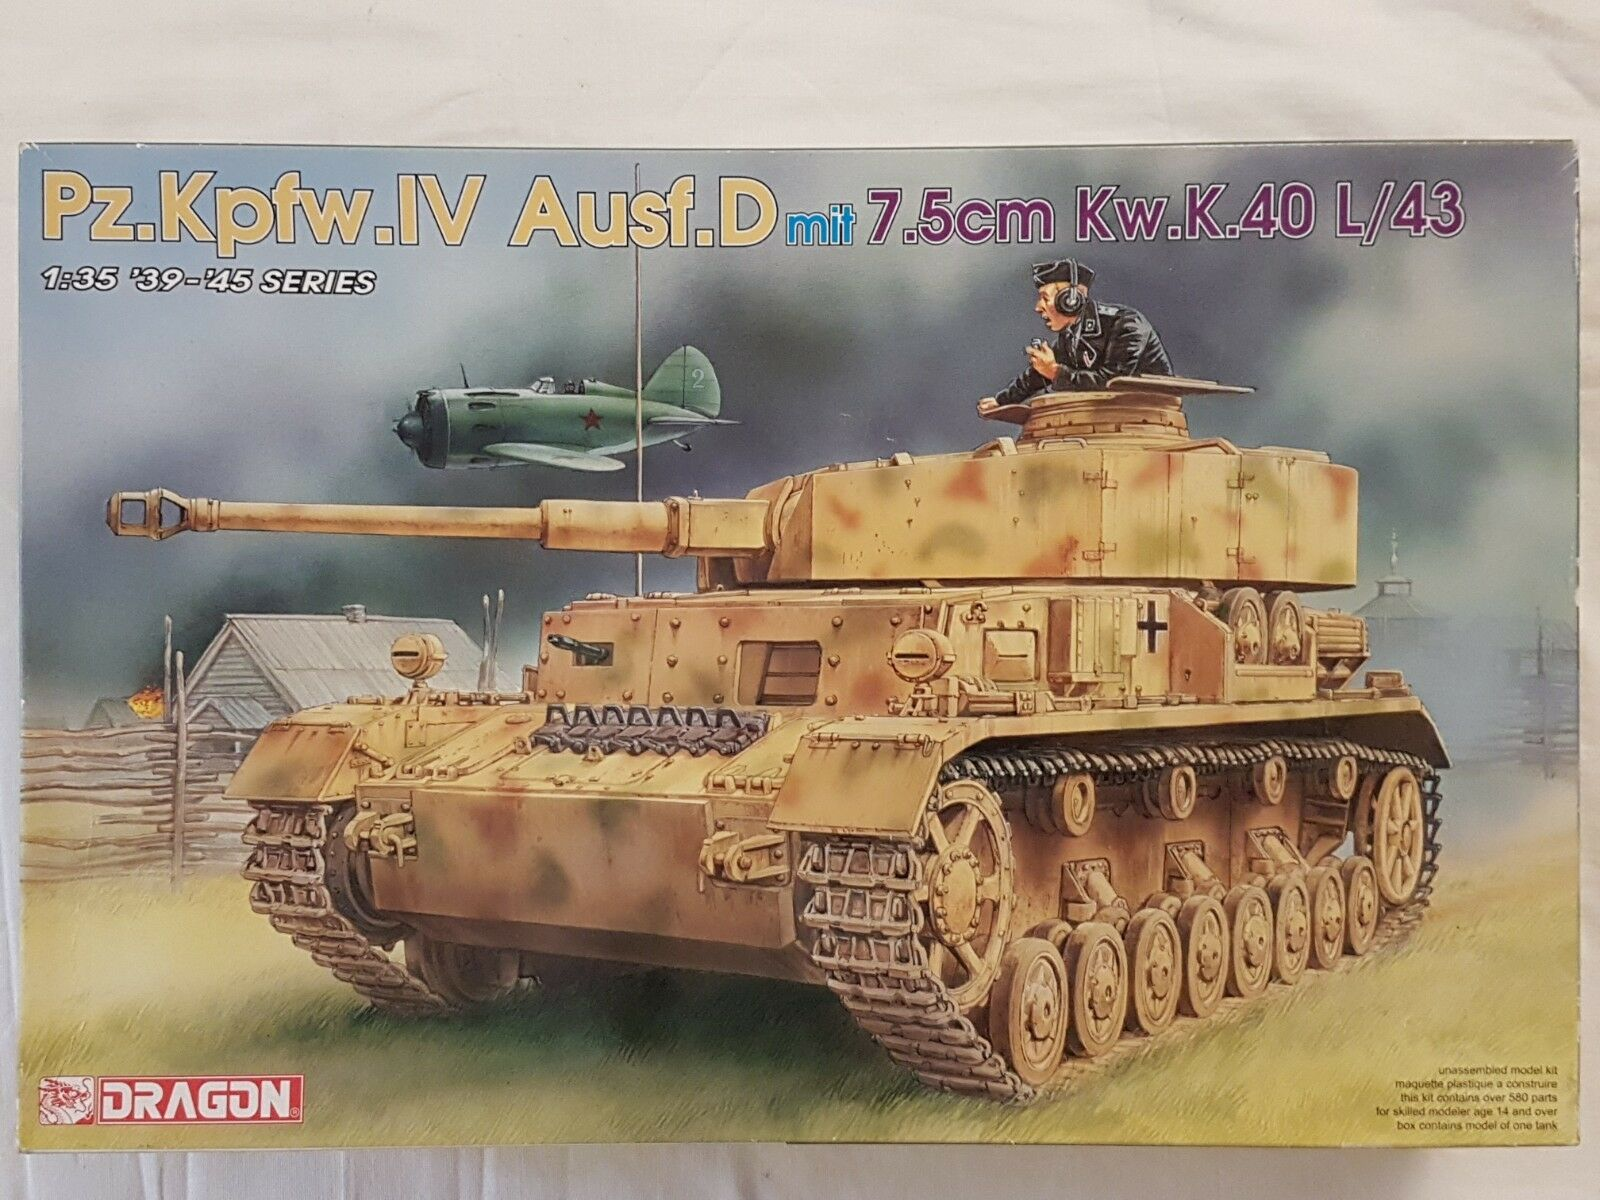 Dragon 6330 Pz.Kpfw.IV Ausf.D mit 7,5cm Kw.K.40 L 43 1 35 Neu und eingetütet